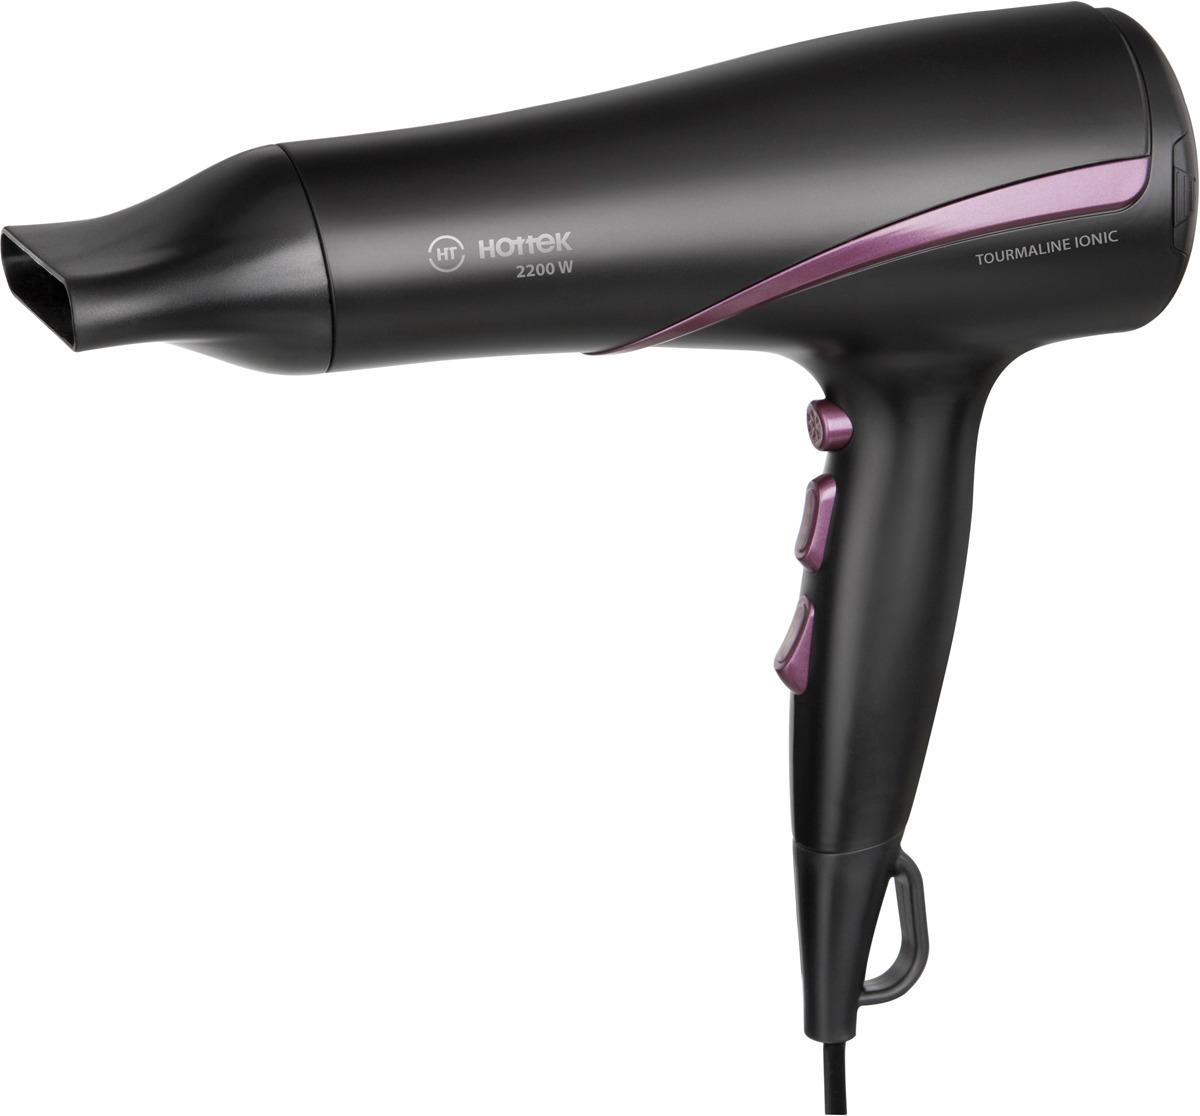 Фен Hottek HT-956-001 для волос фен hottek ht 956 003 black